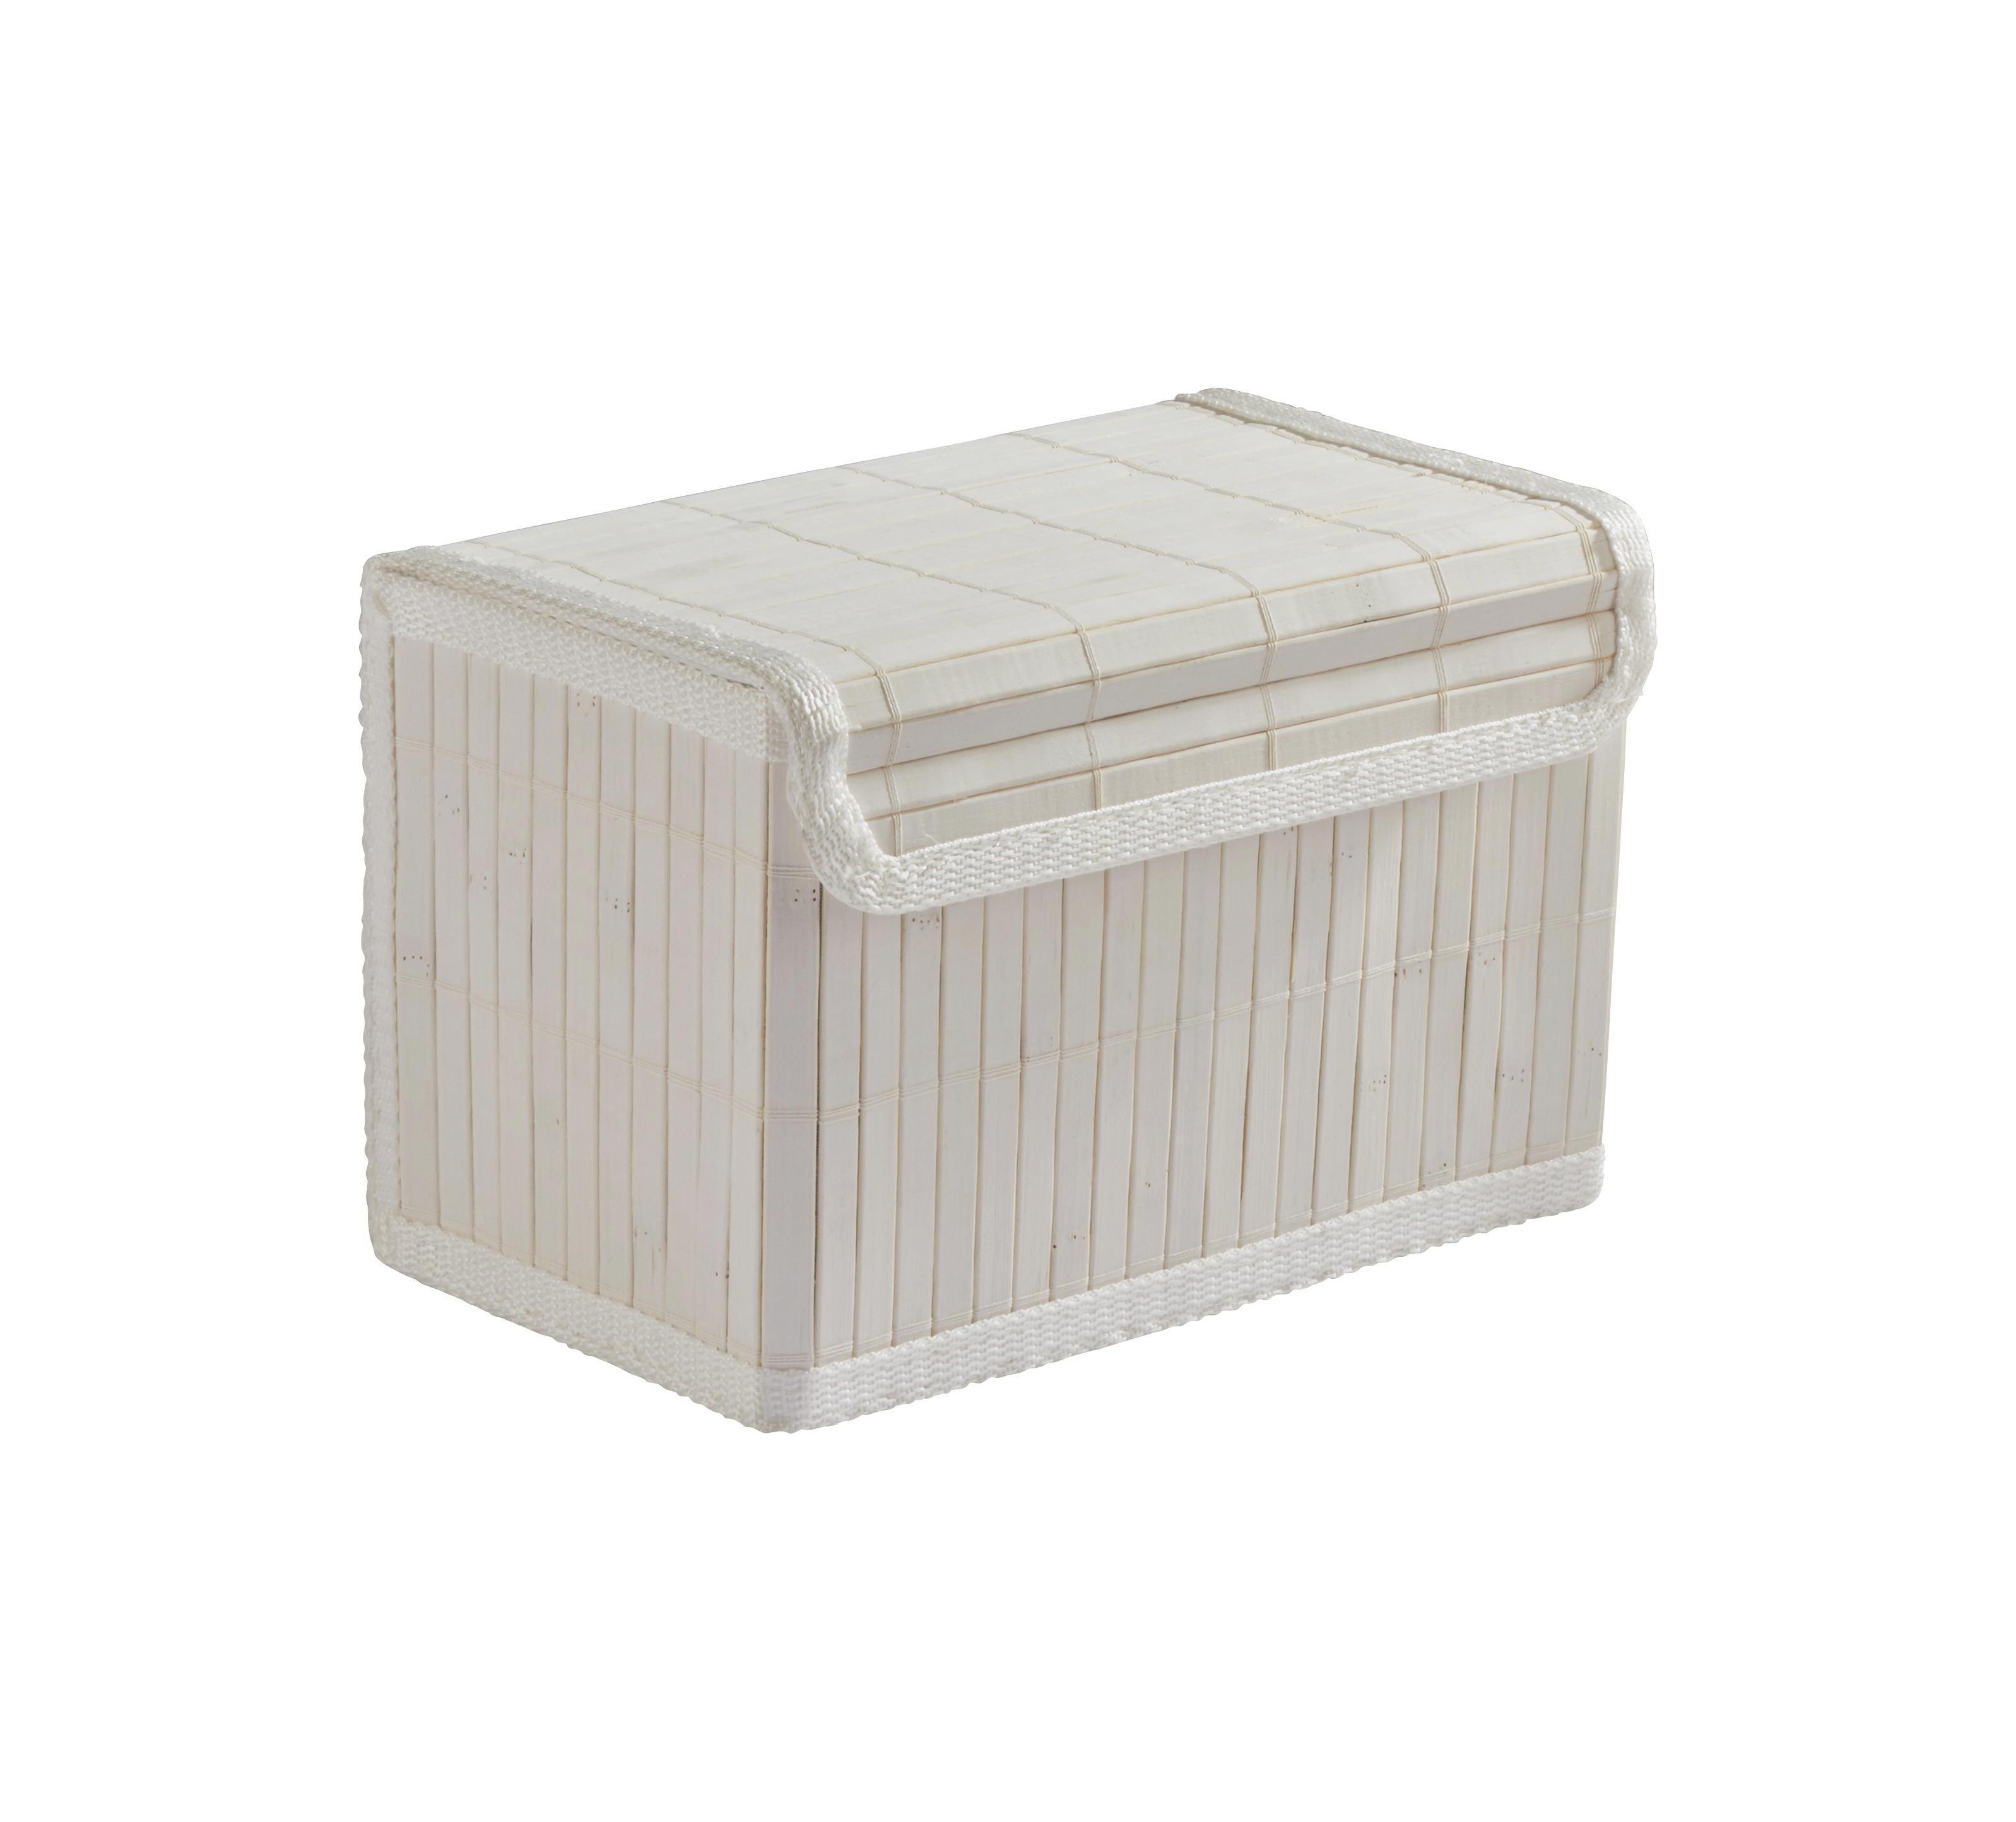 Korb Bamboo White - Weiß, Holz (22/15/16cm) - MÖMAX modern living